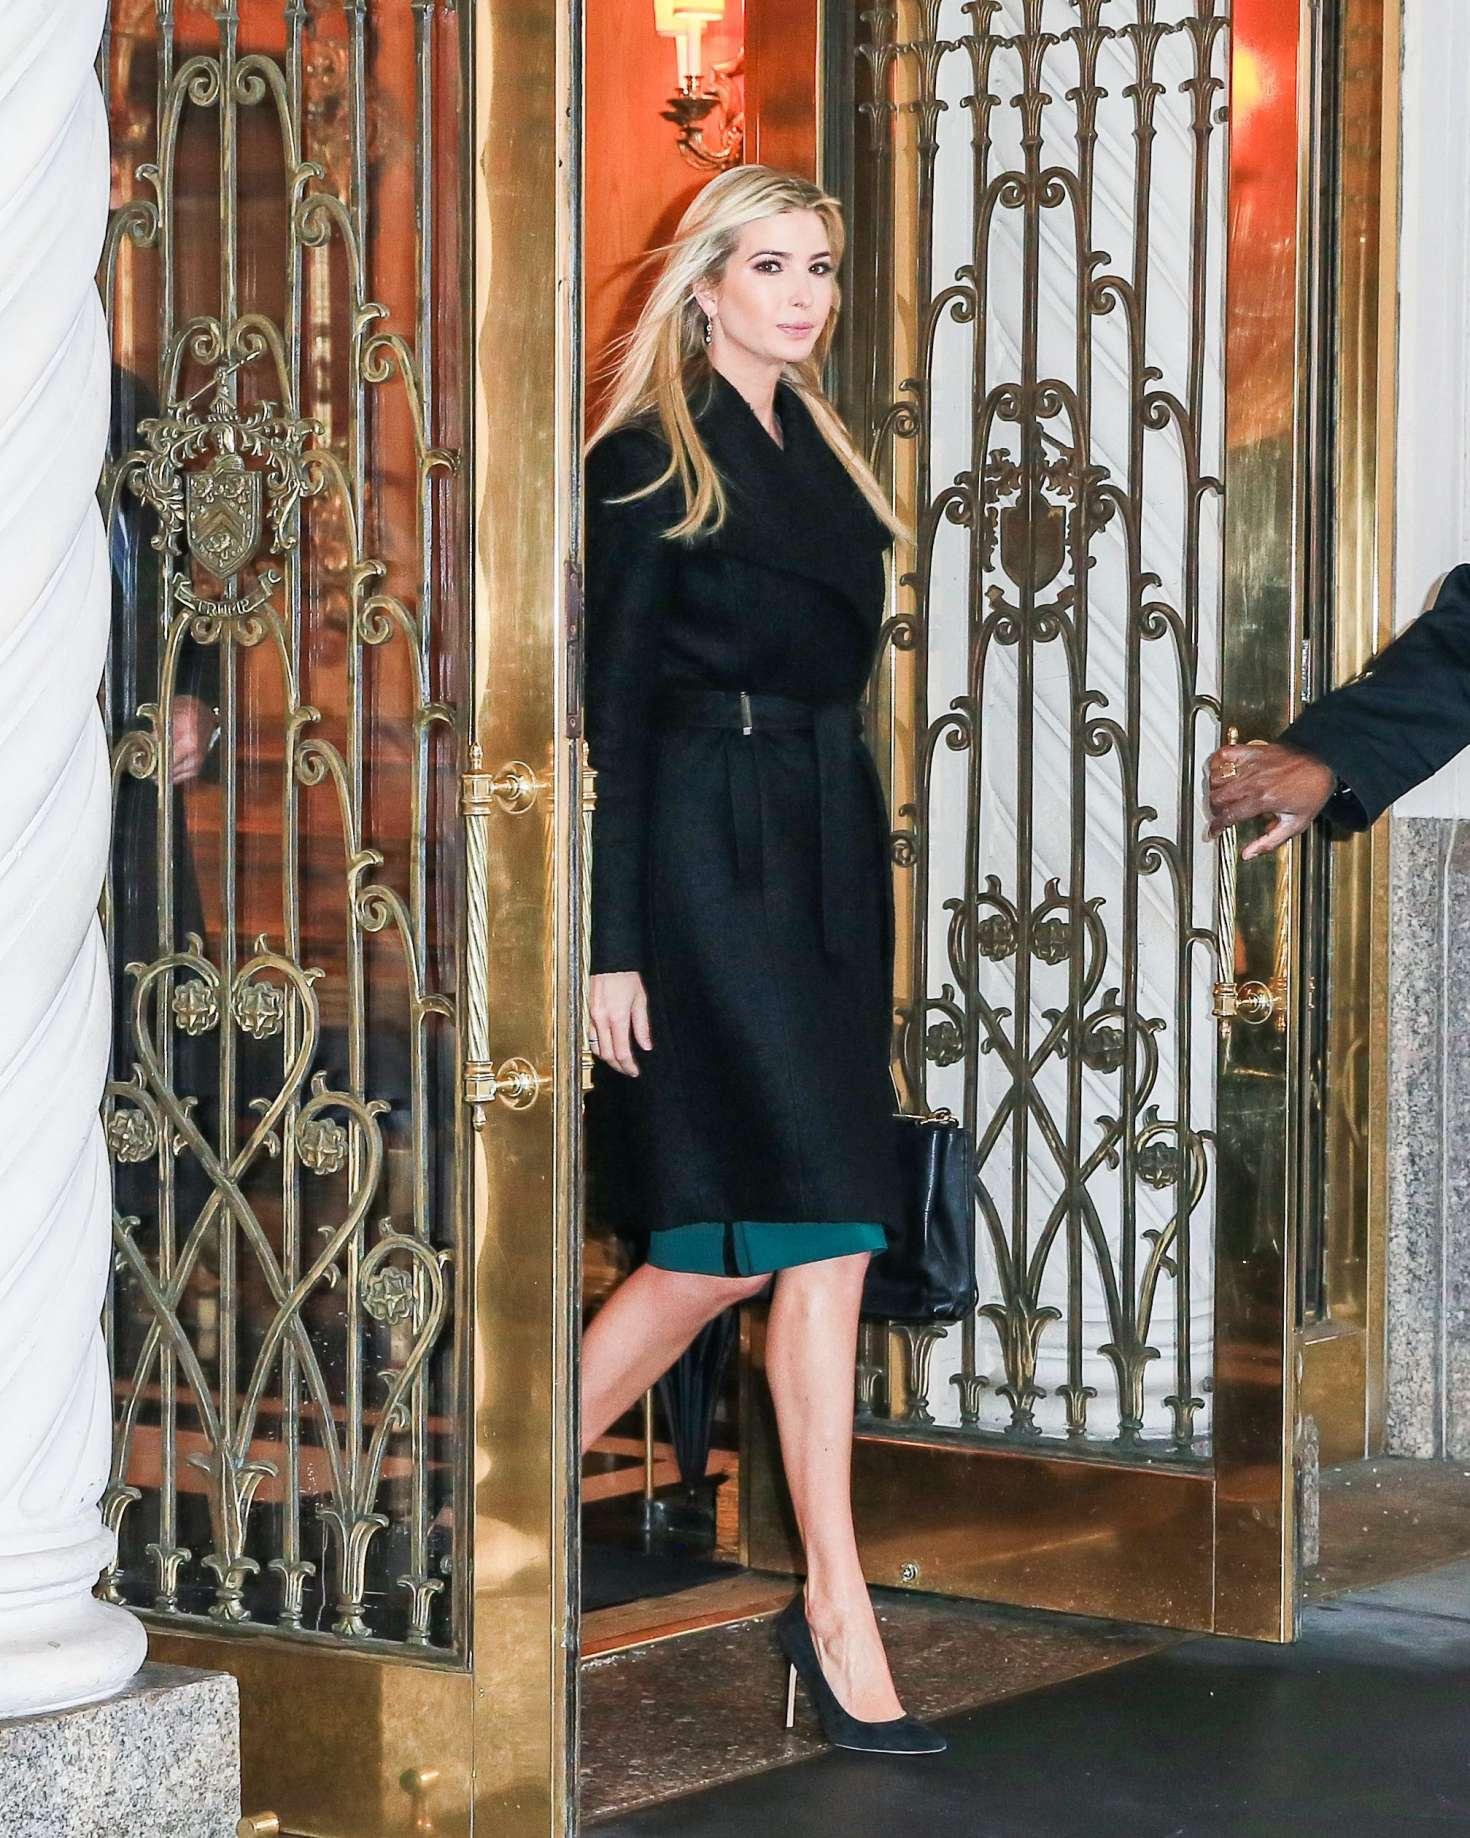 Ivanka Trump 2017 : Ivanka Trump: Heads To Work in New York -15